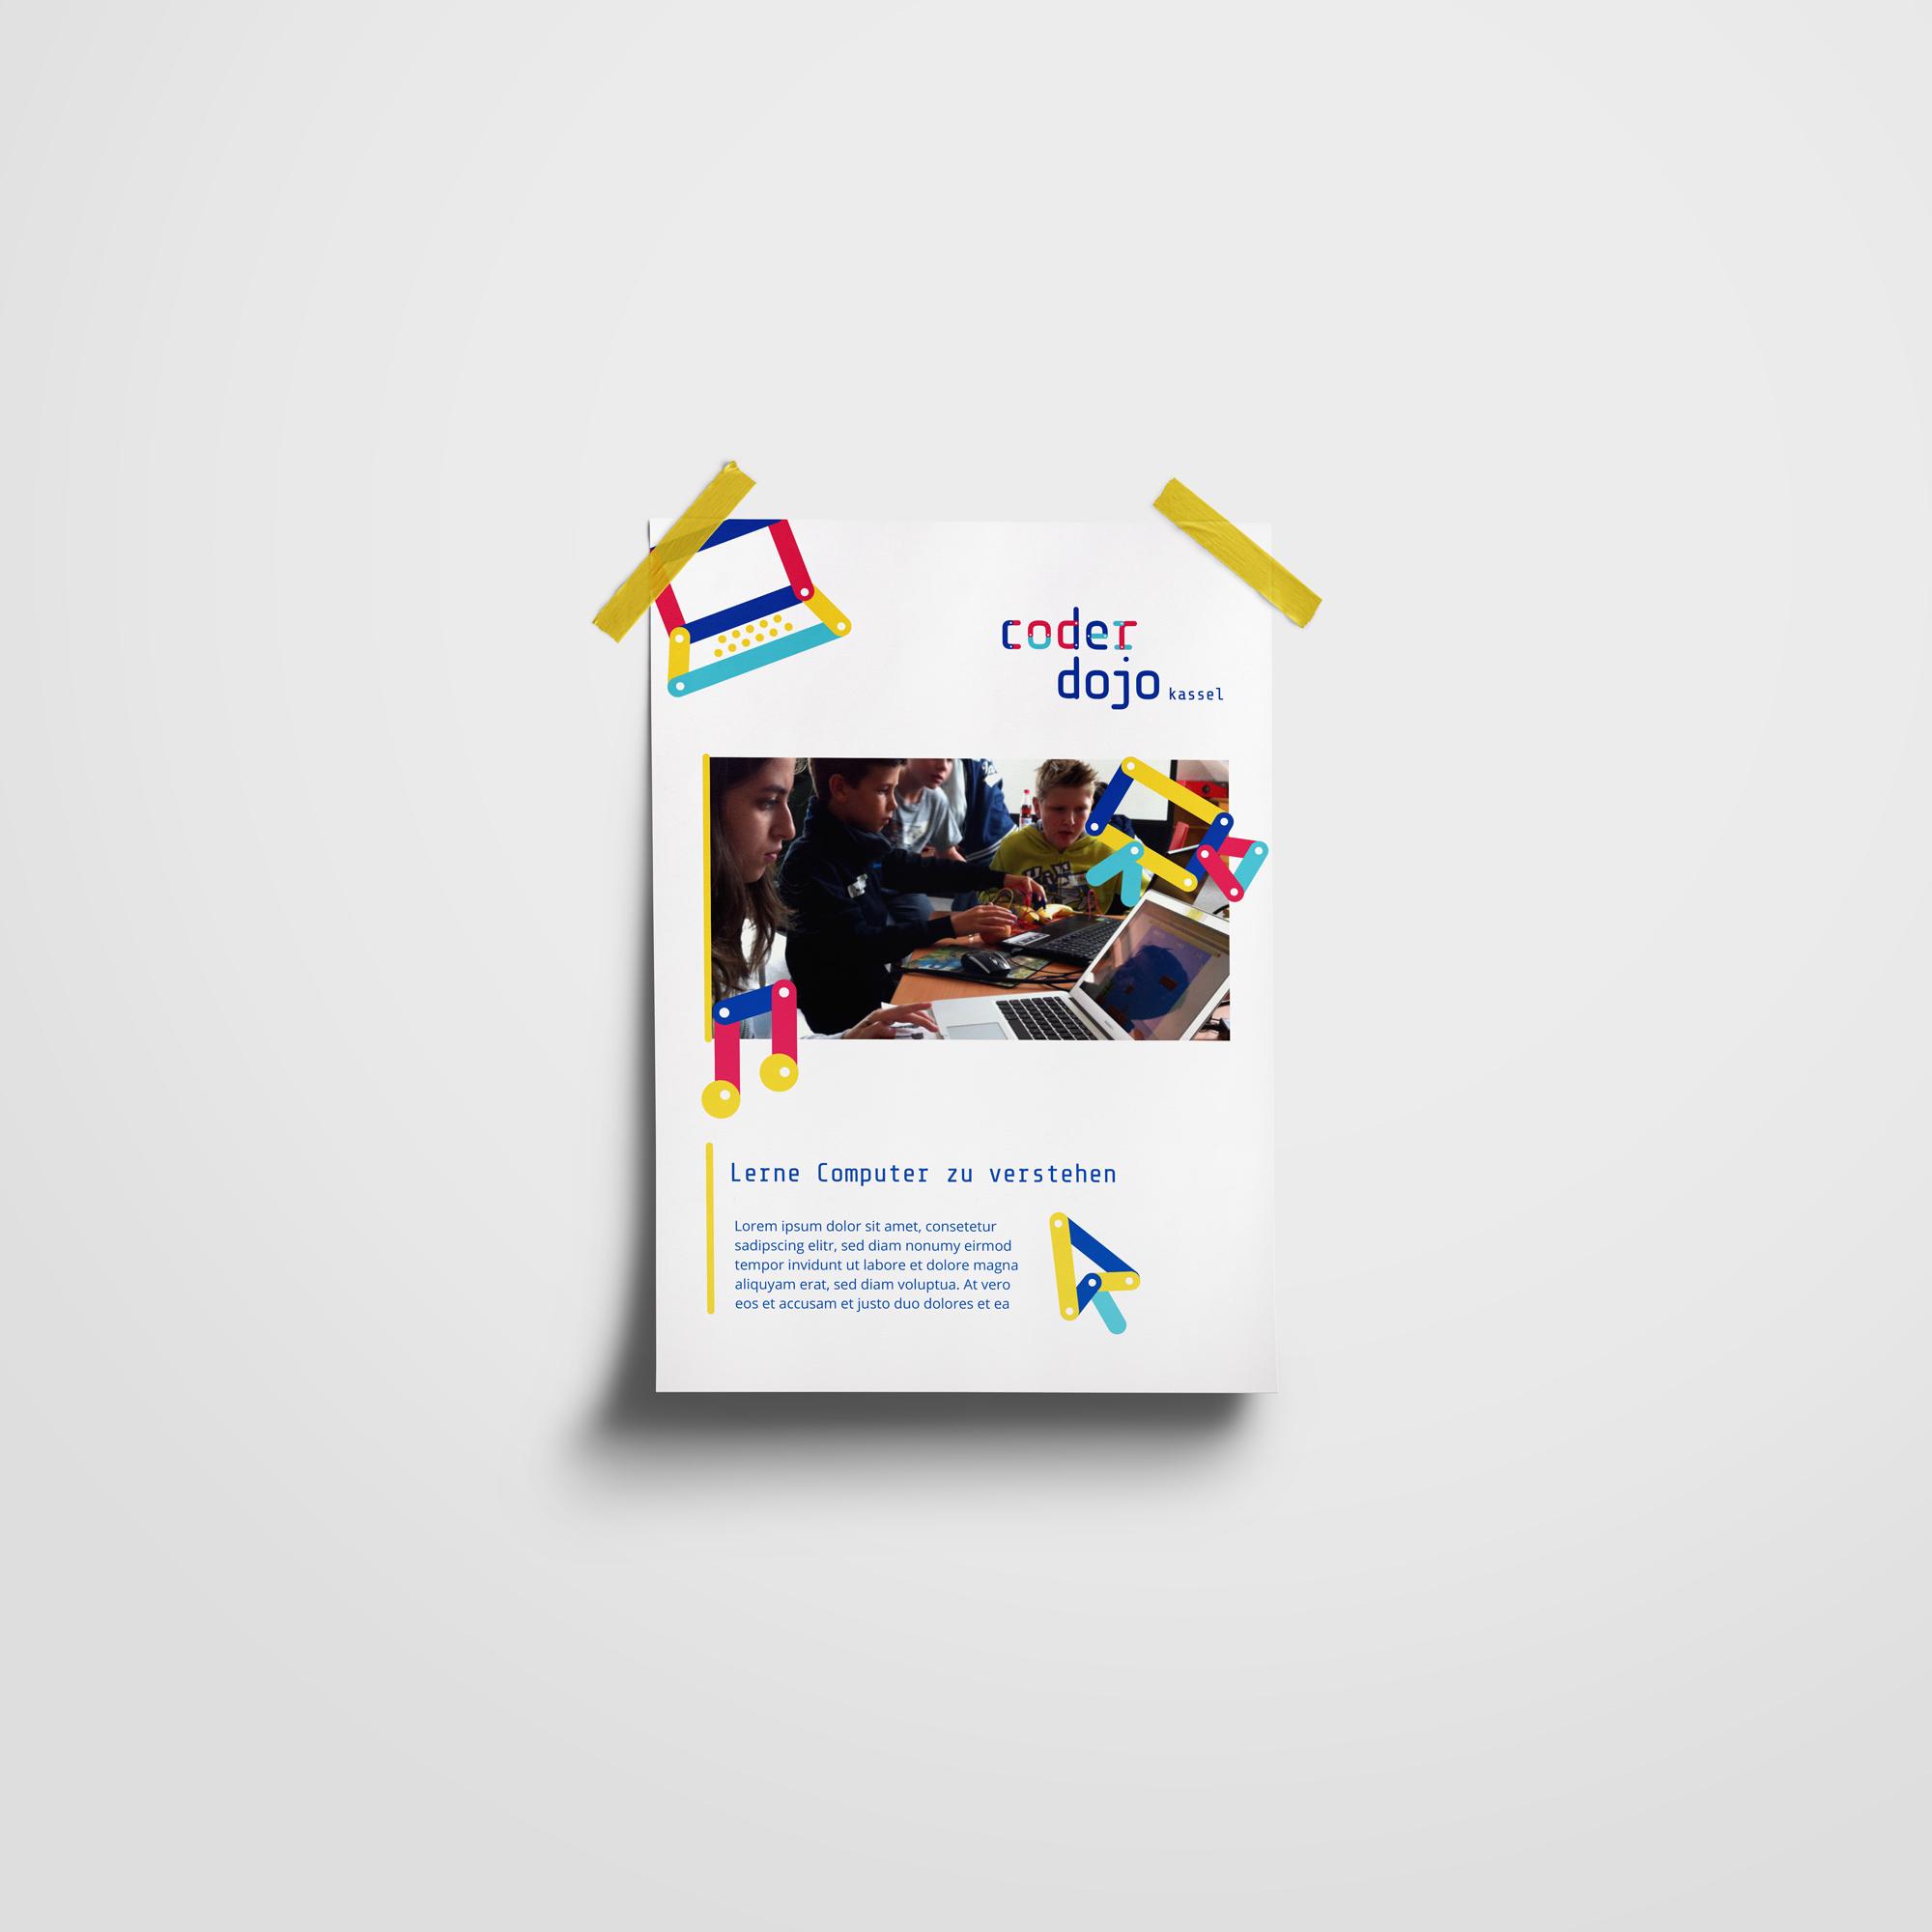 Plakat, Entwurf, CoderDojo